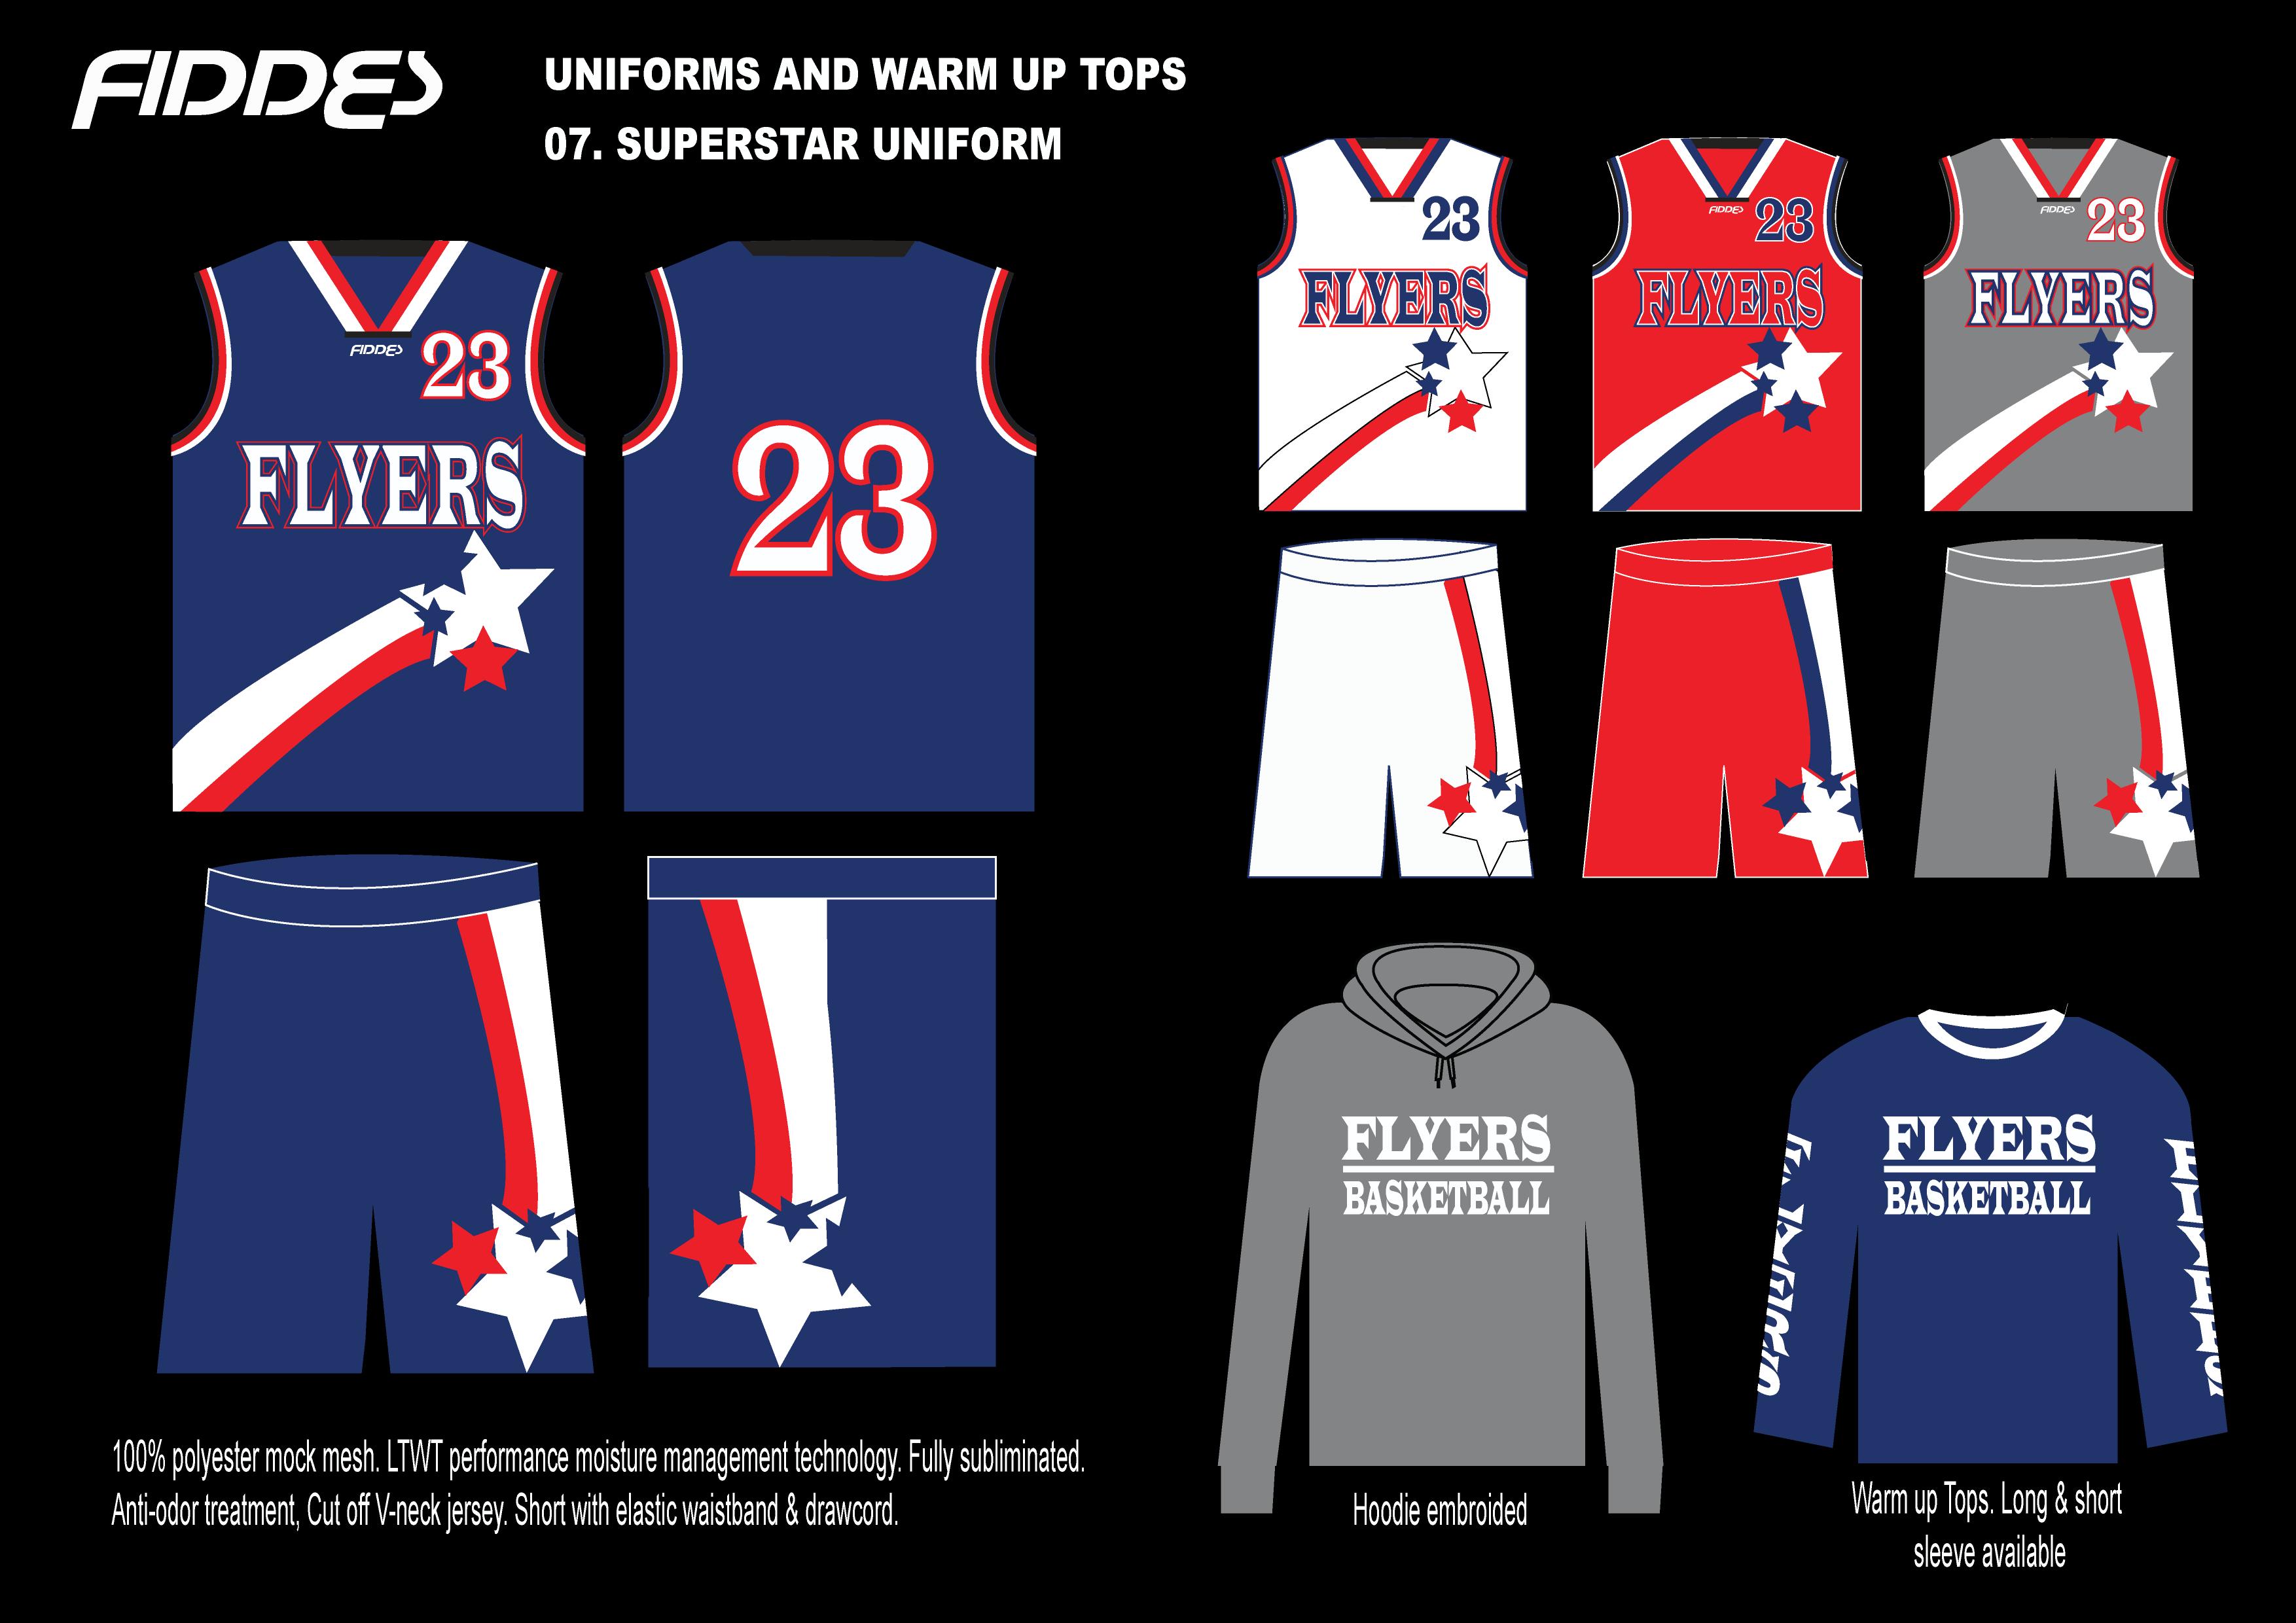 07. Superstar Uniform